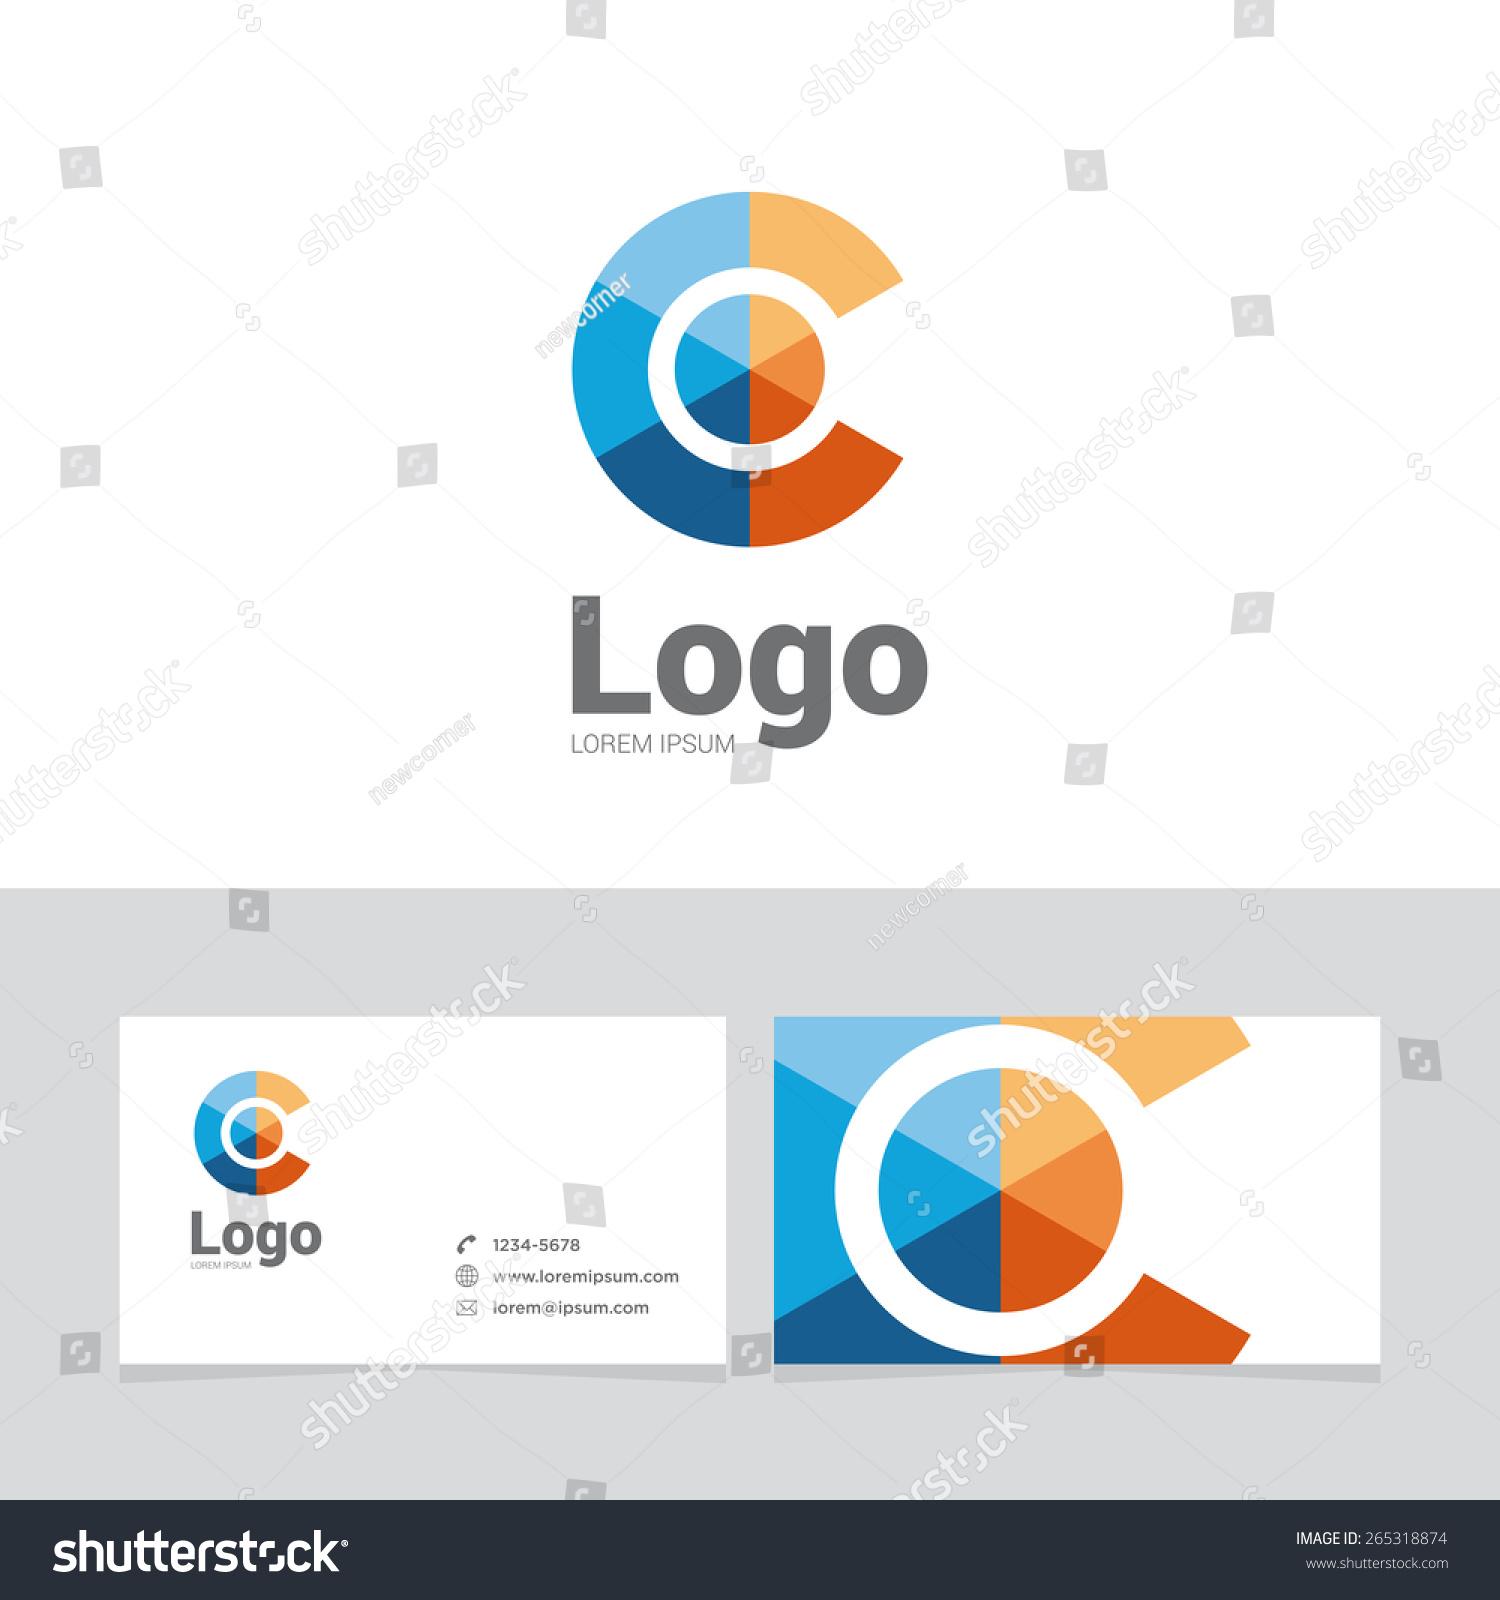 Logo design element two business cards stock photo photo vector logo design element with two business cards logo letter sphere symbol colourmoves